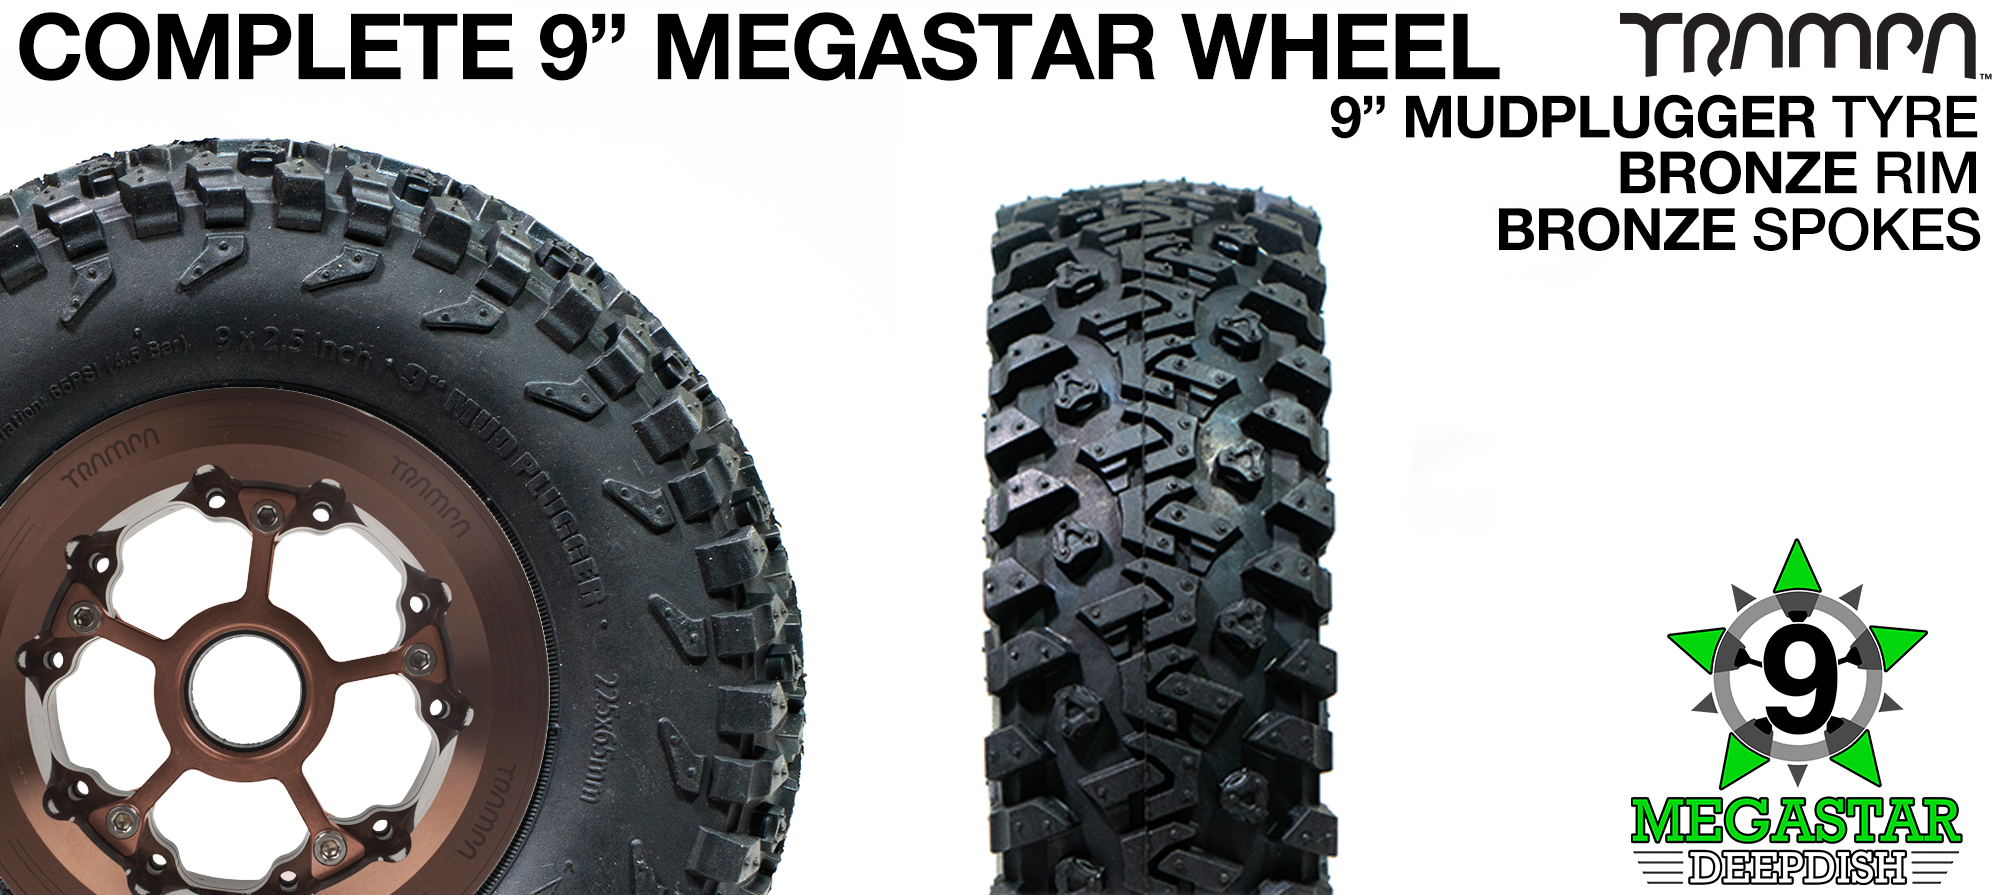 BRONZE 9 inch Deep-Dish MEGASTARS Rim with BRONZE Spokes & 9 Inch MUDPLUGGER Tyres